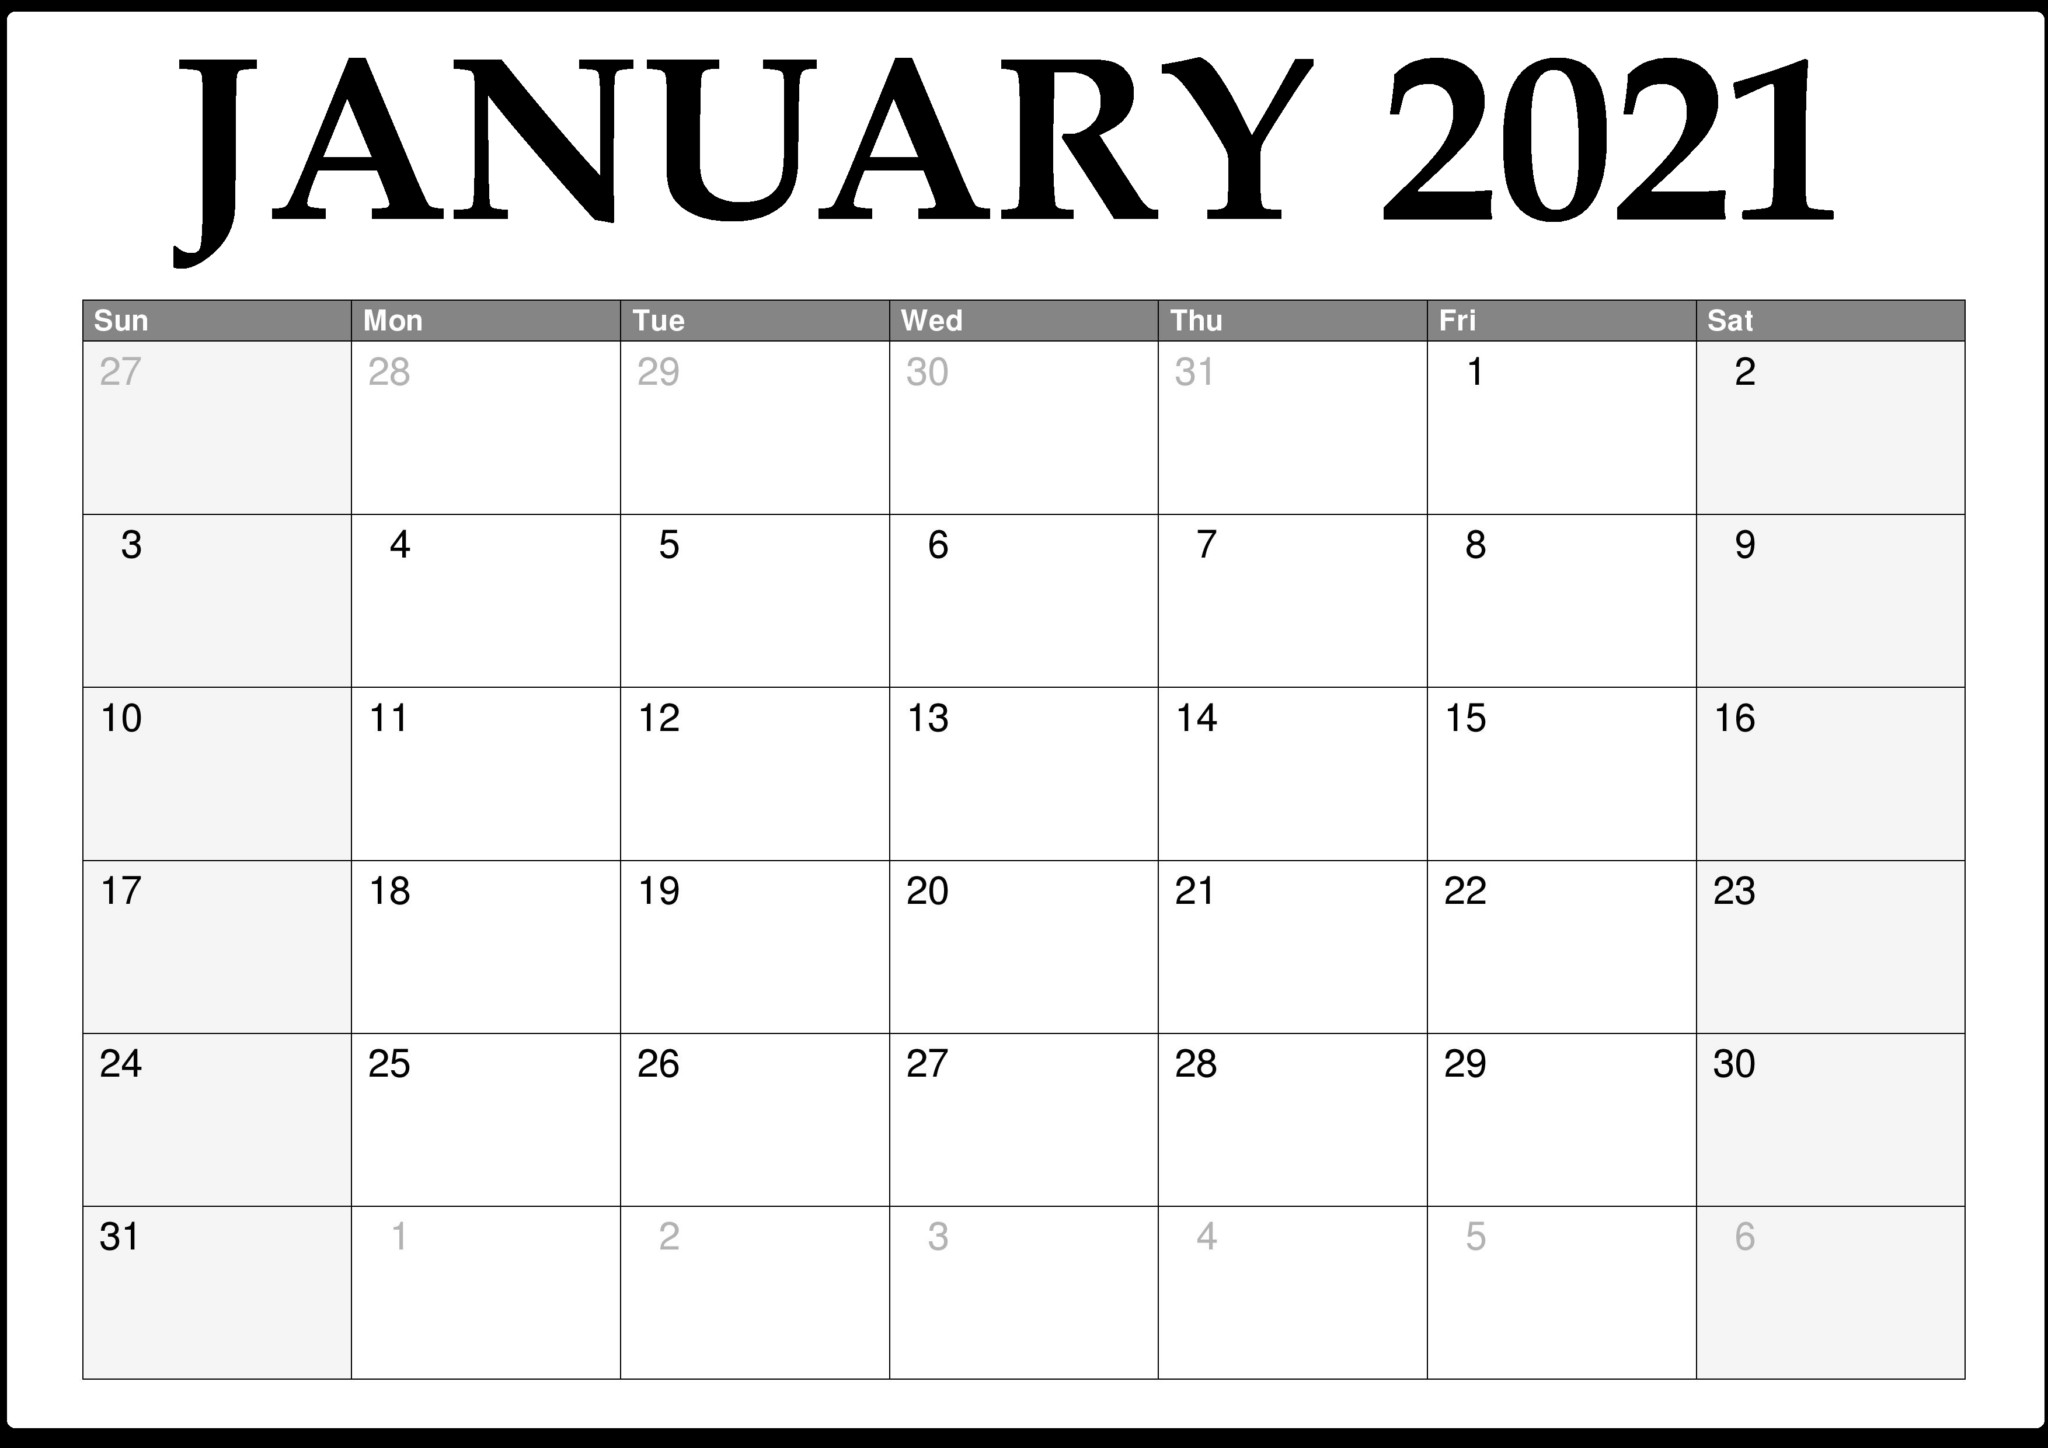 January 2021 Calendar Printable in 2021